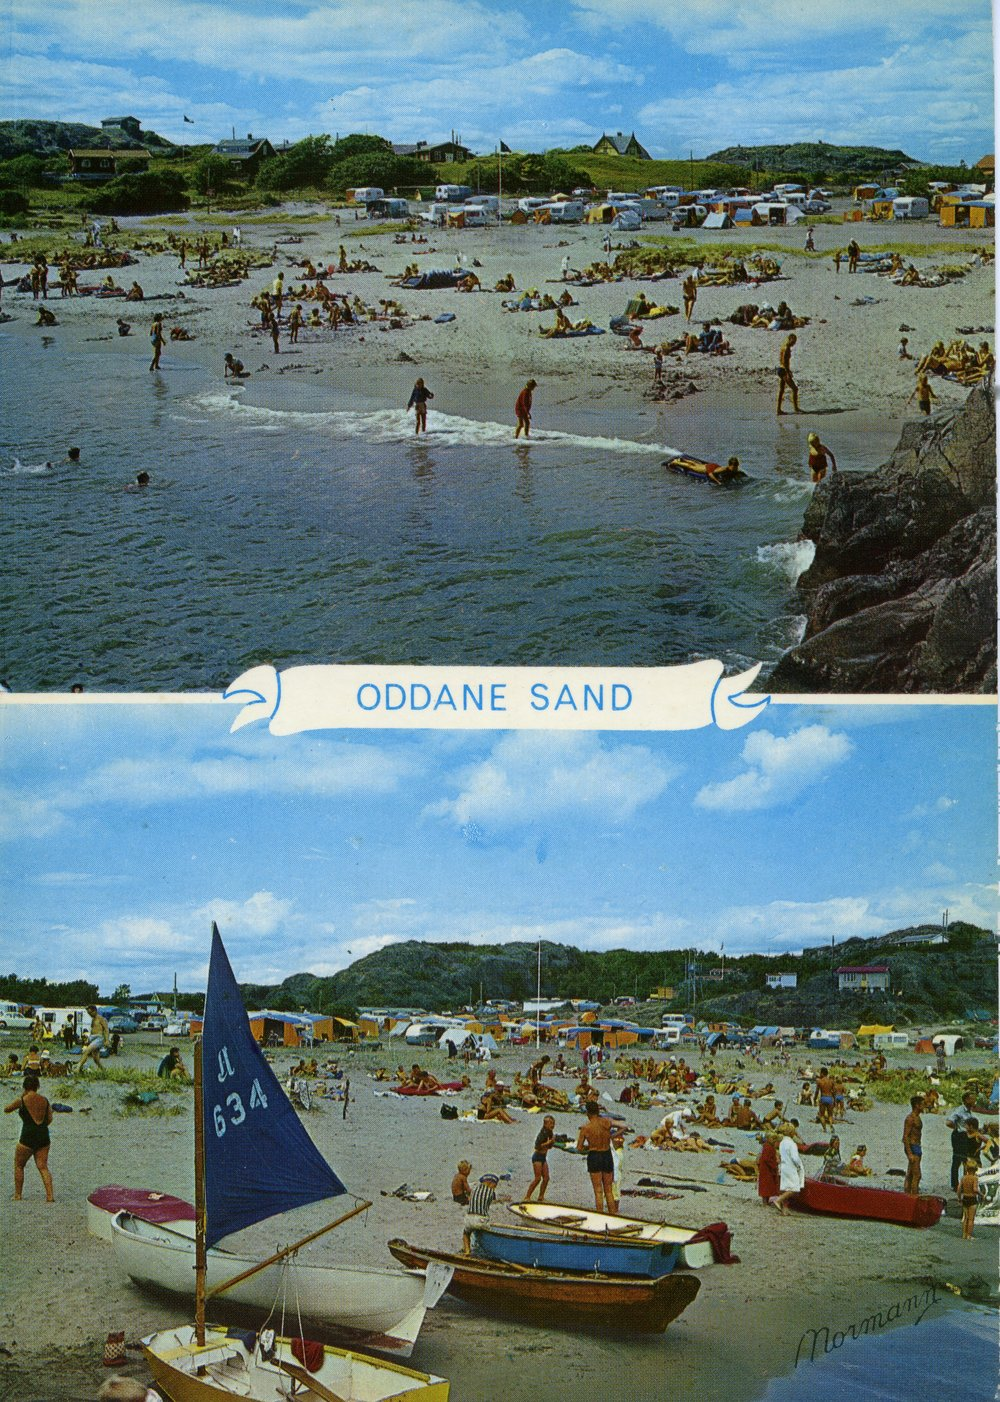 Oddane Sand (kort) (1).jpg